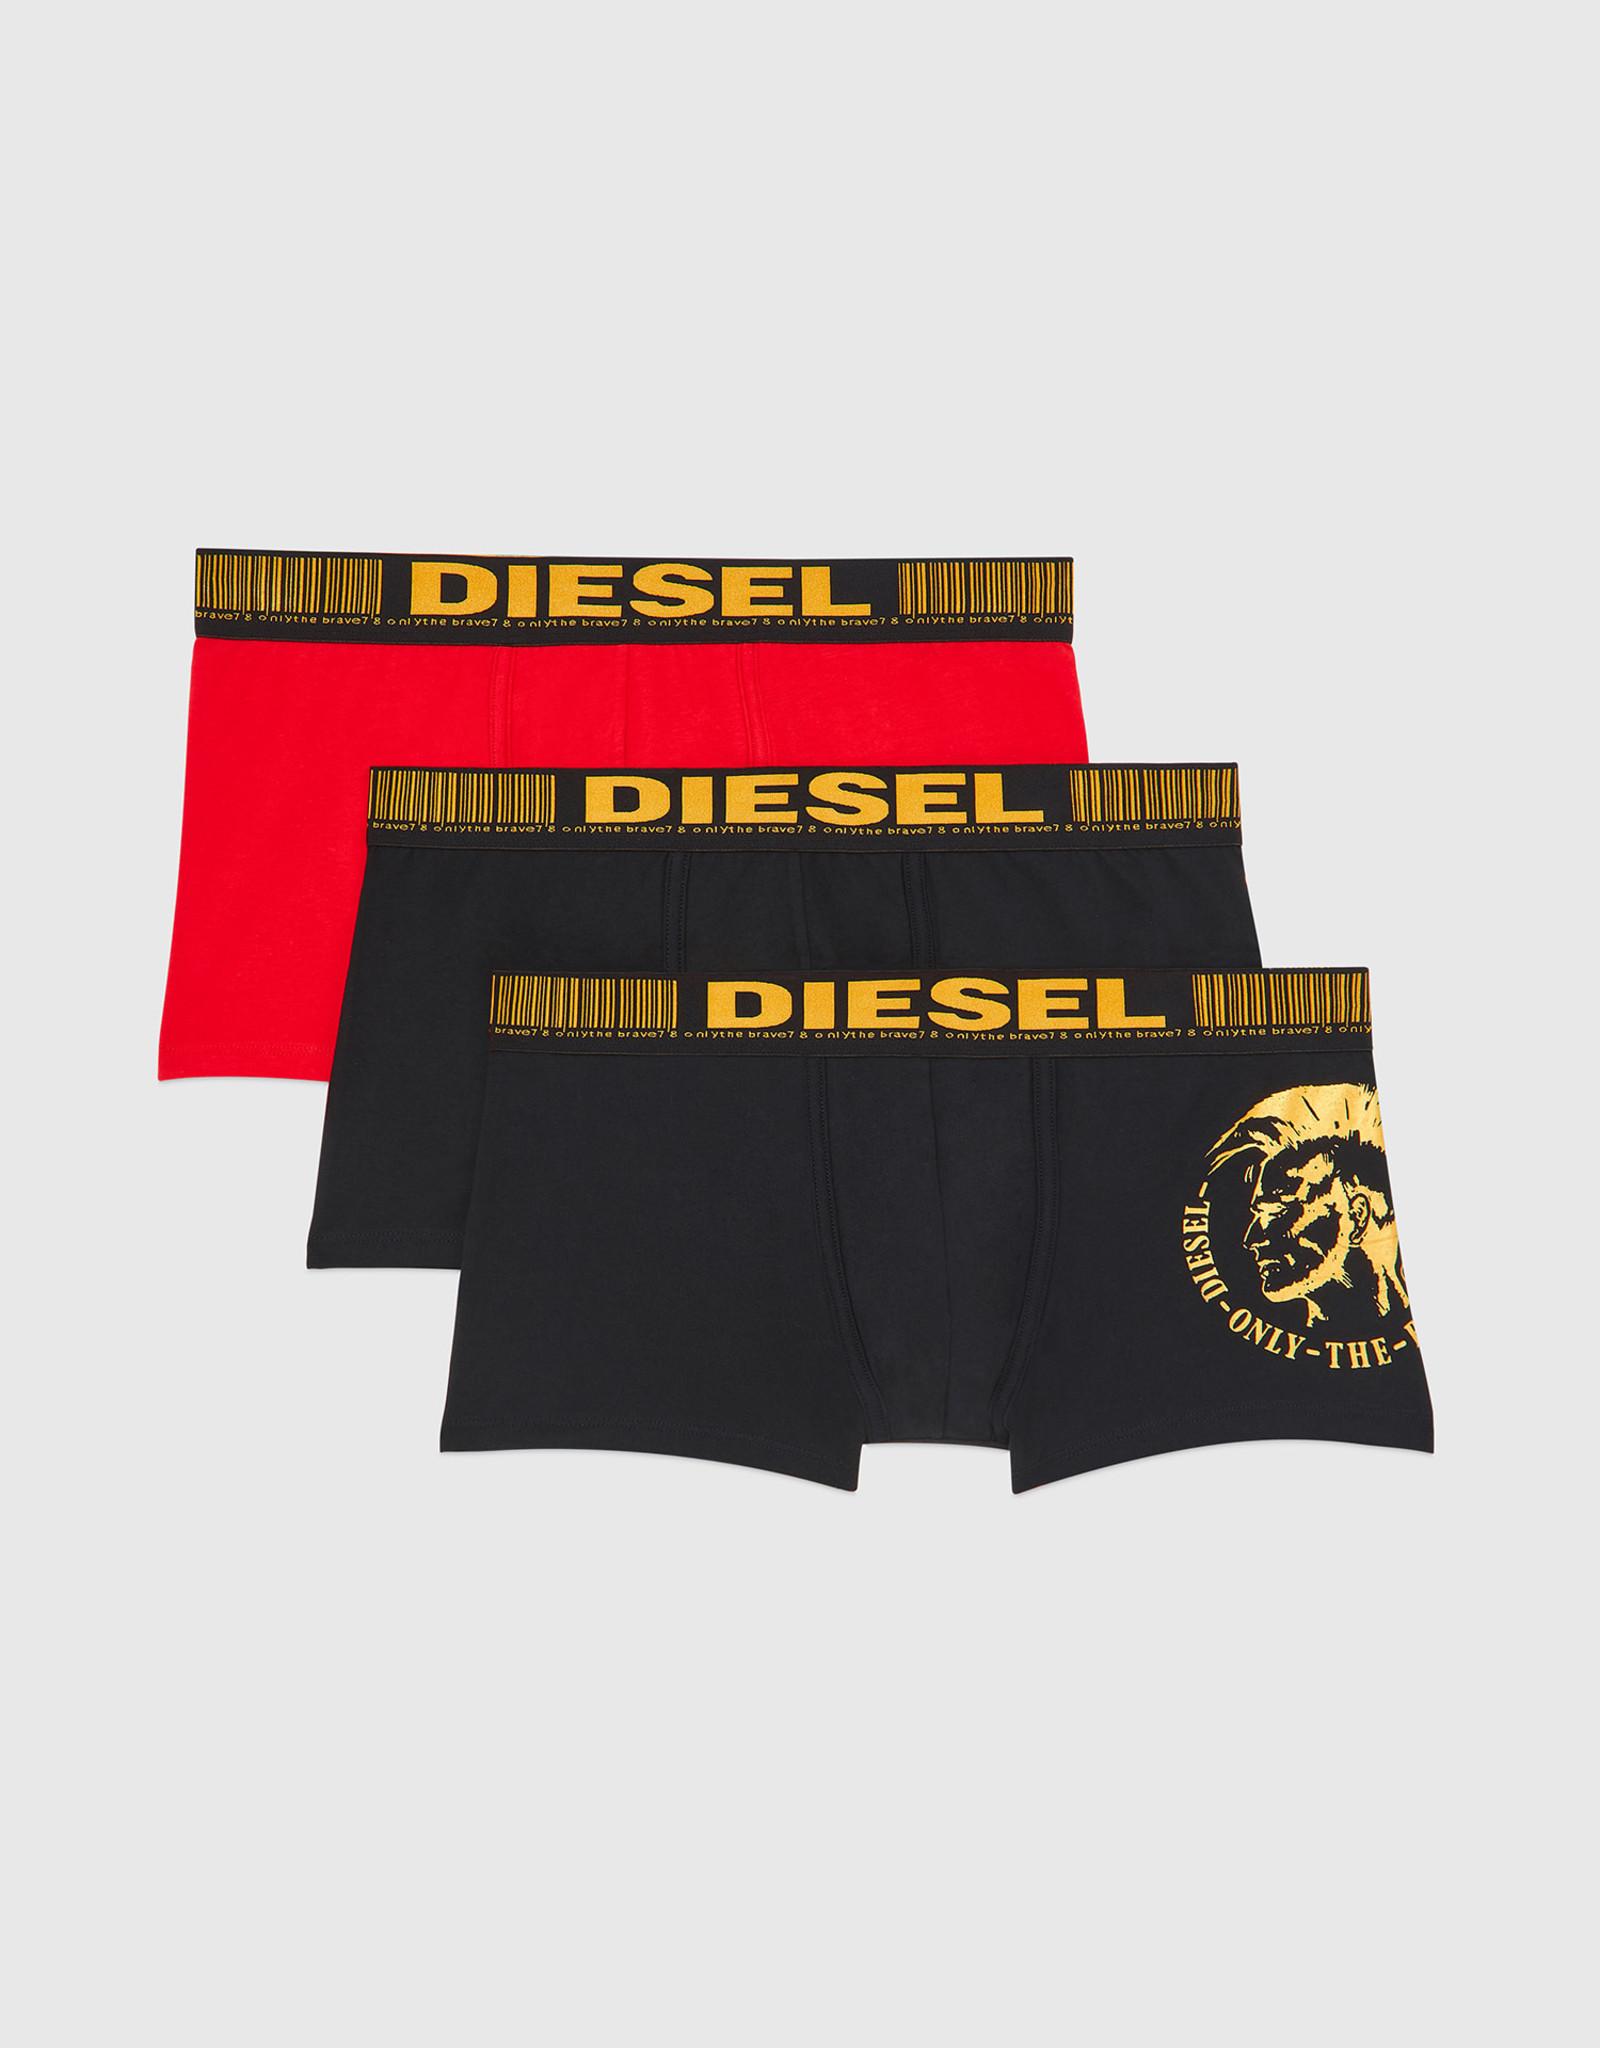 Diesel 3pk Damien  Foil Mohawk Boxer